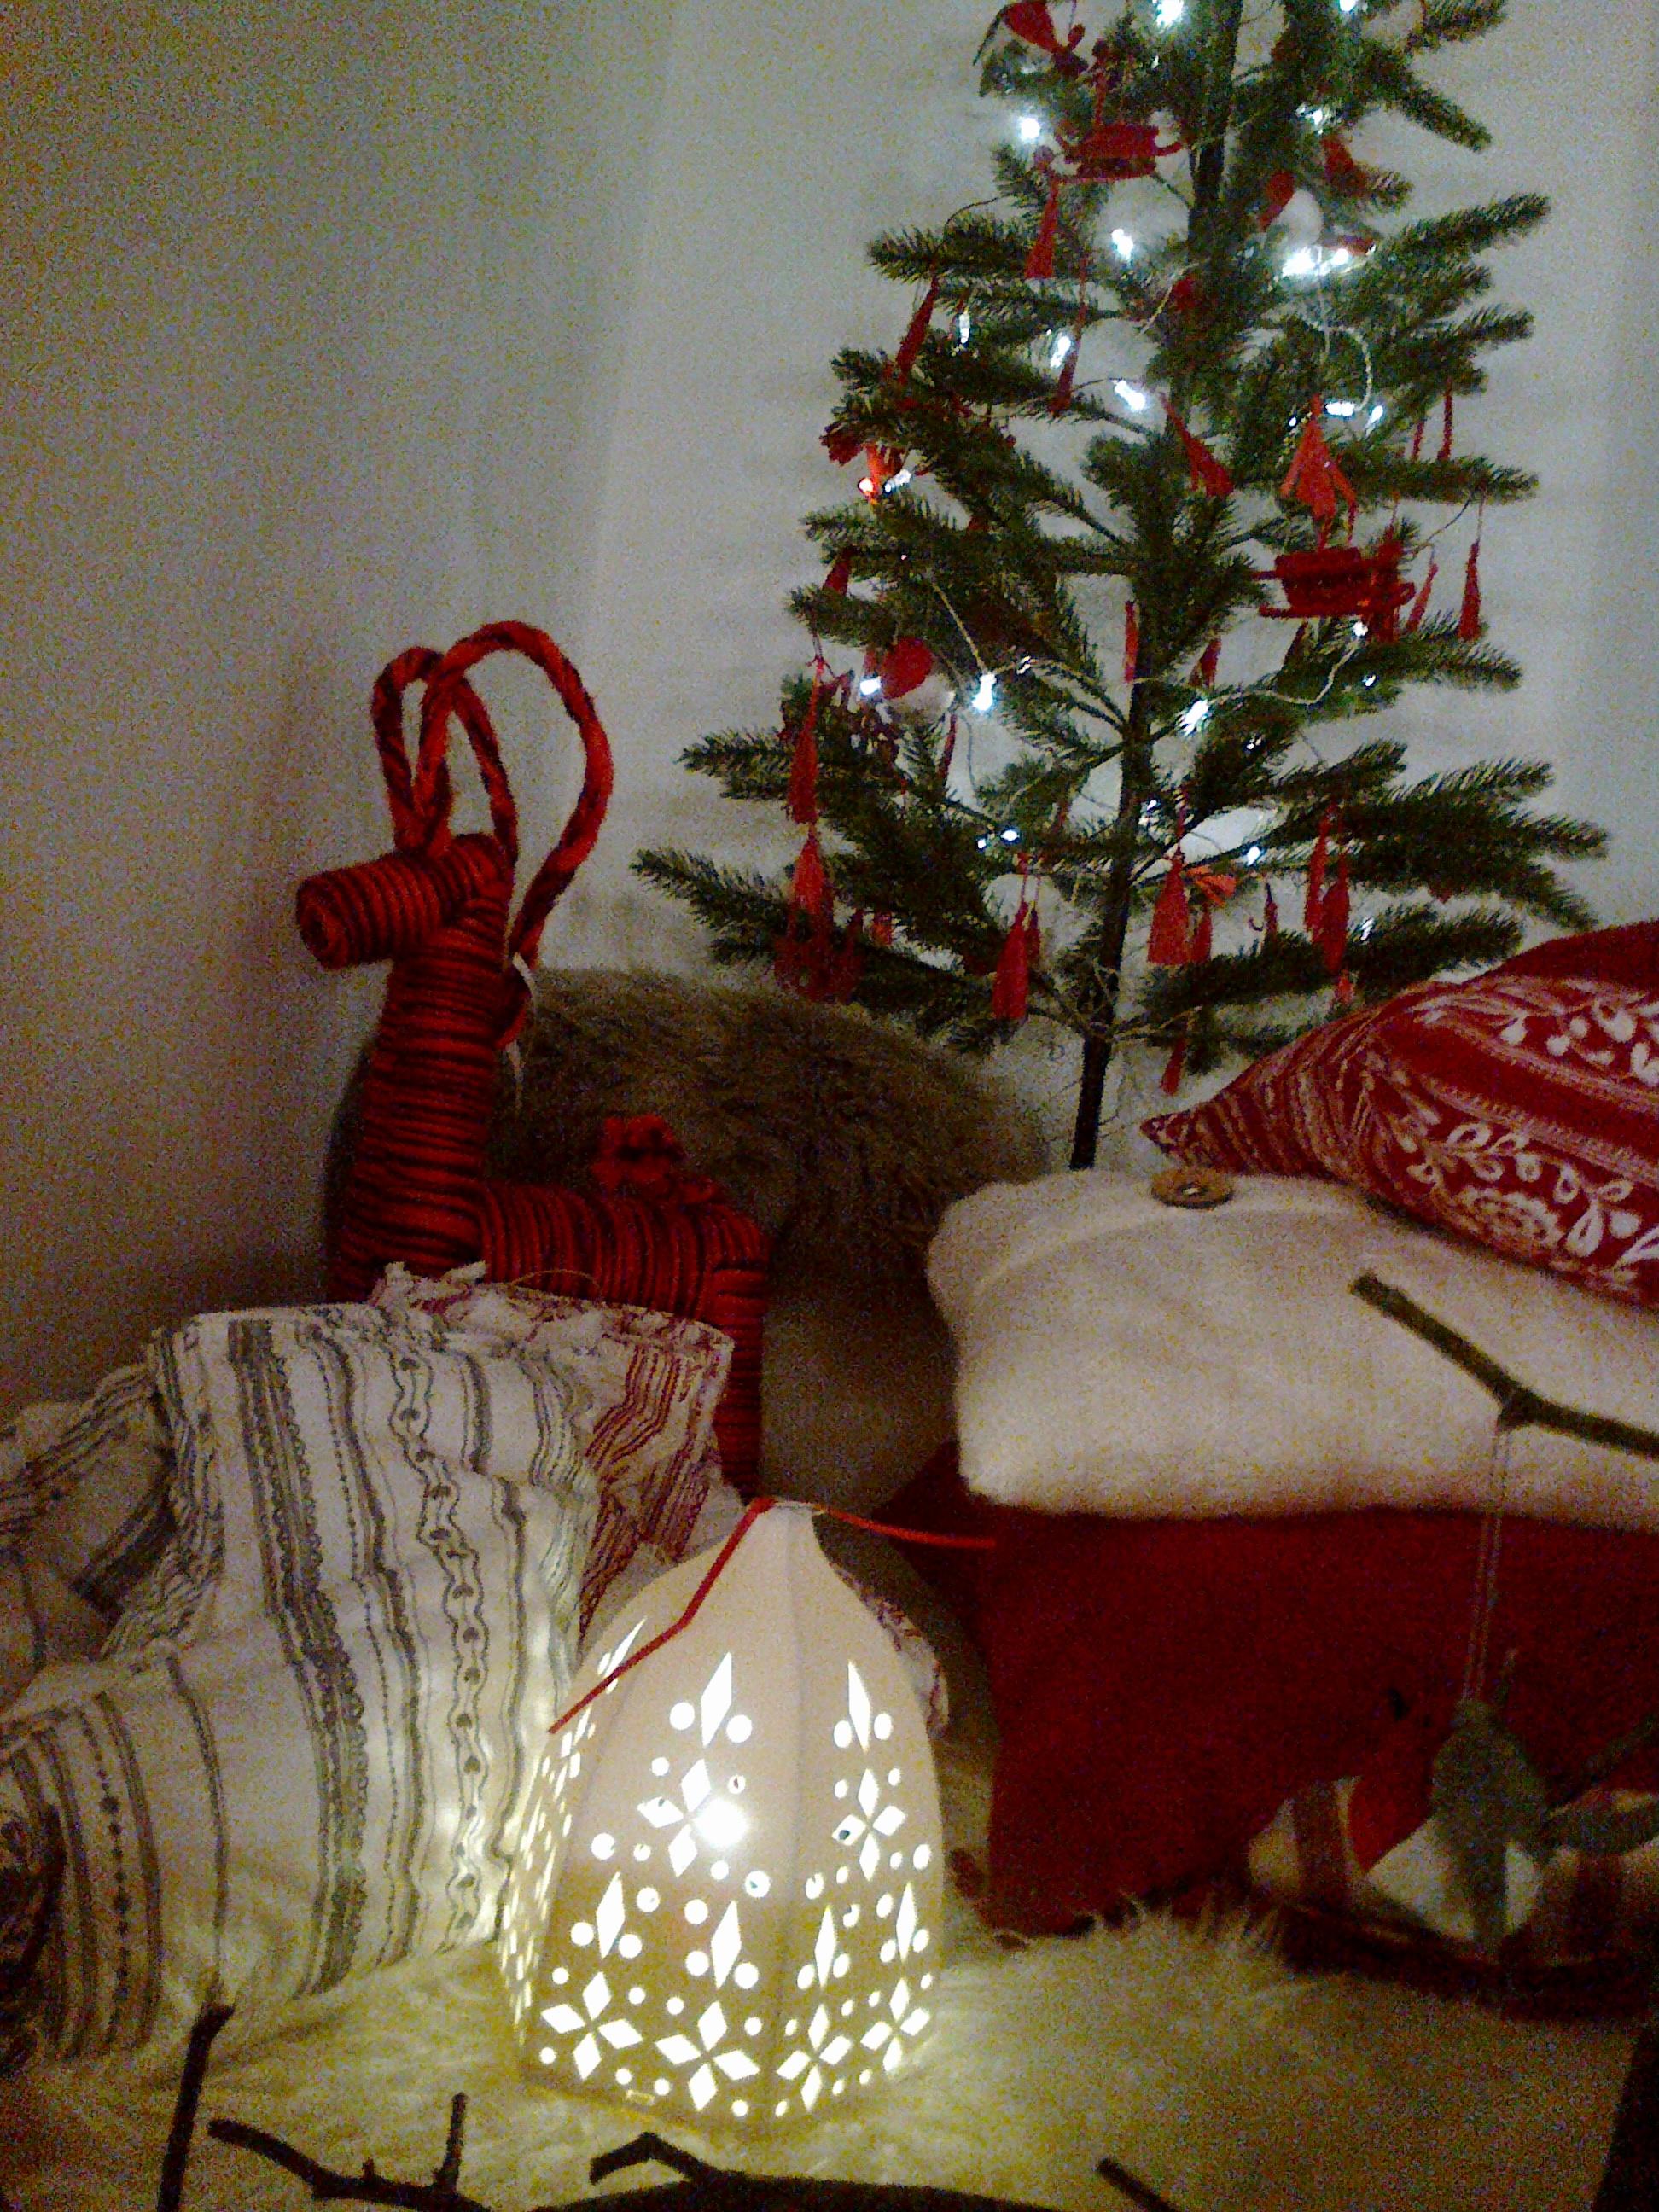 IKEA Karácsony 2014 Konyhasziget (20).jpg